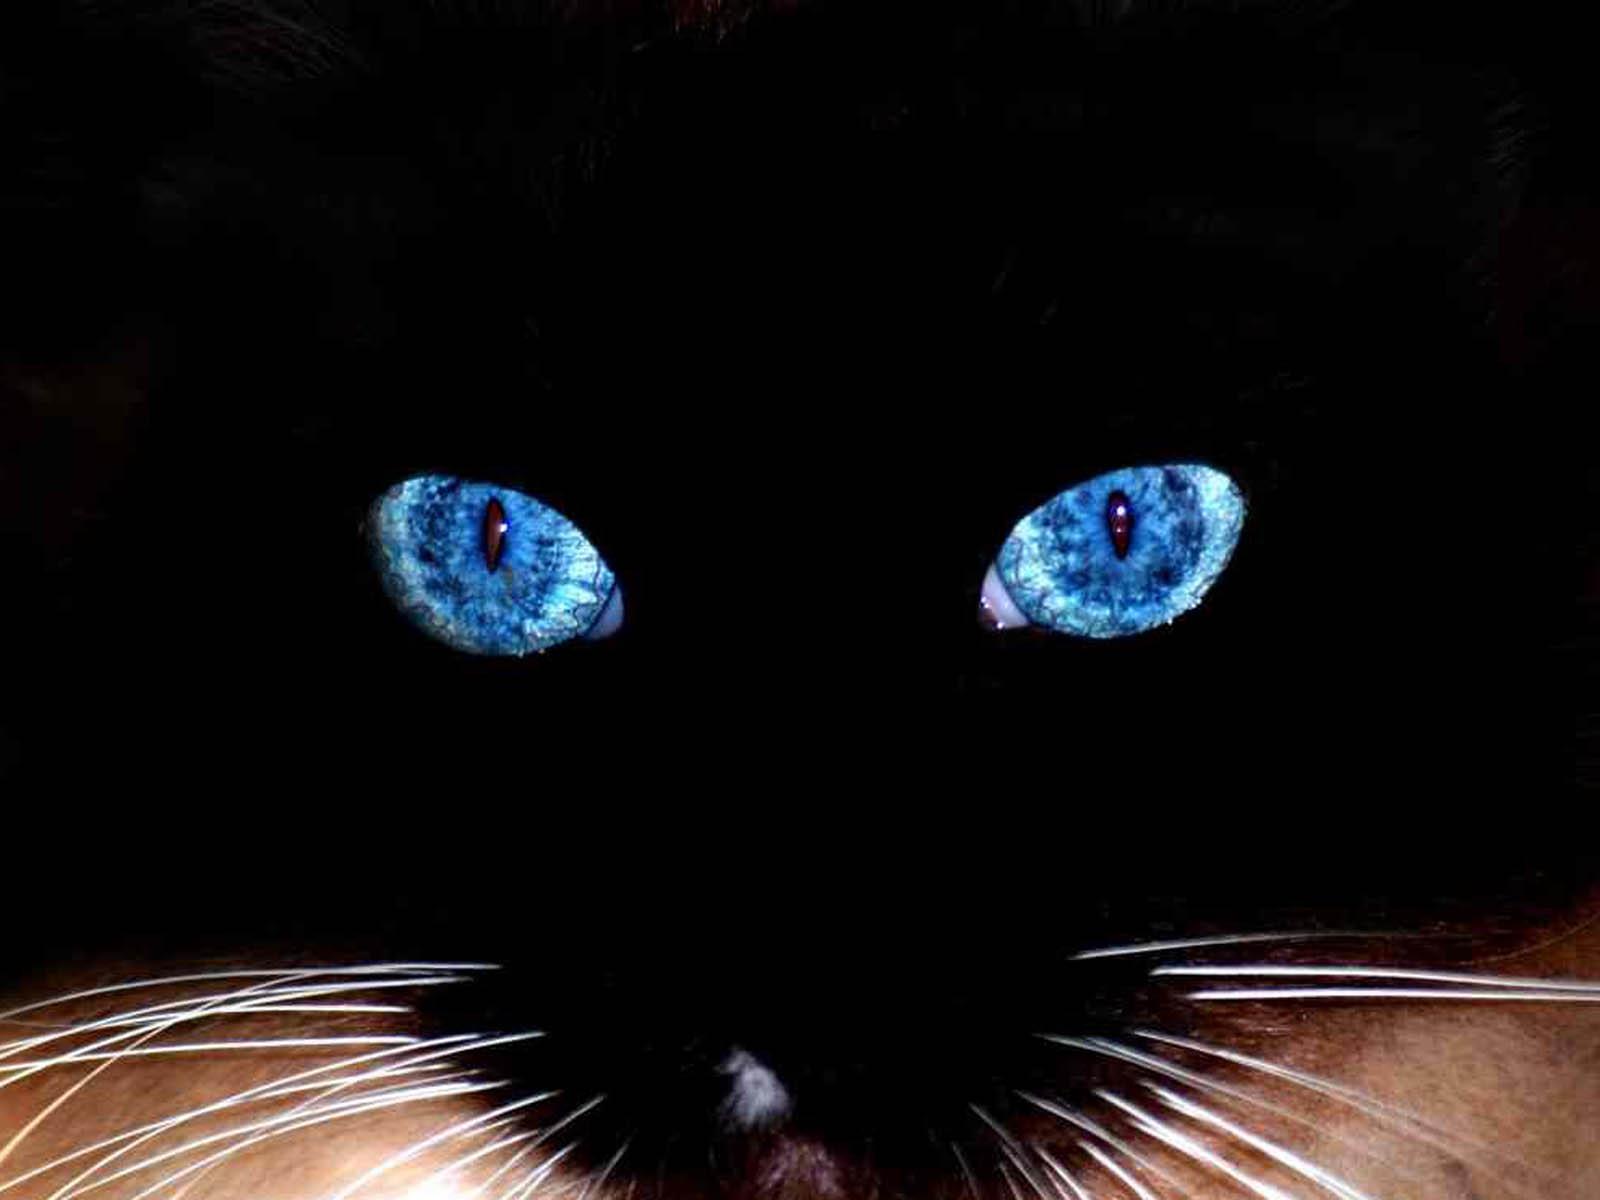 Black+Cat+Blue+Eyes+1